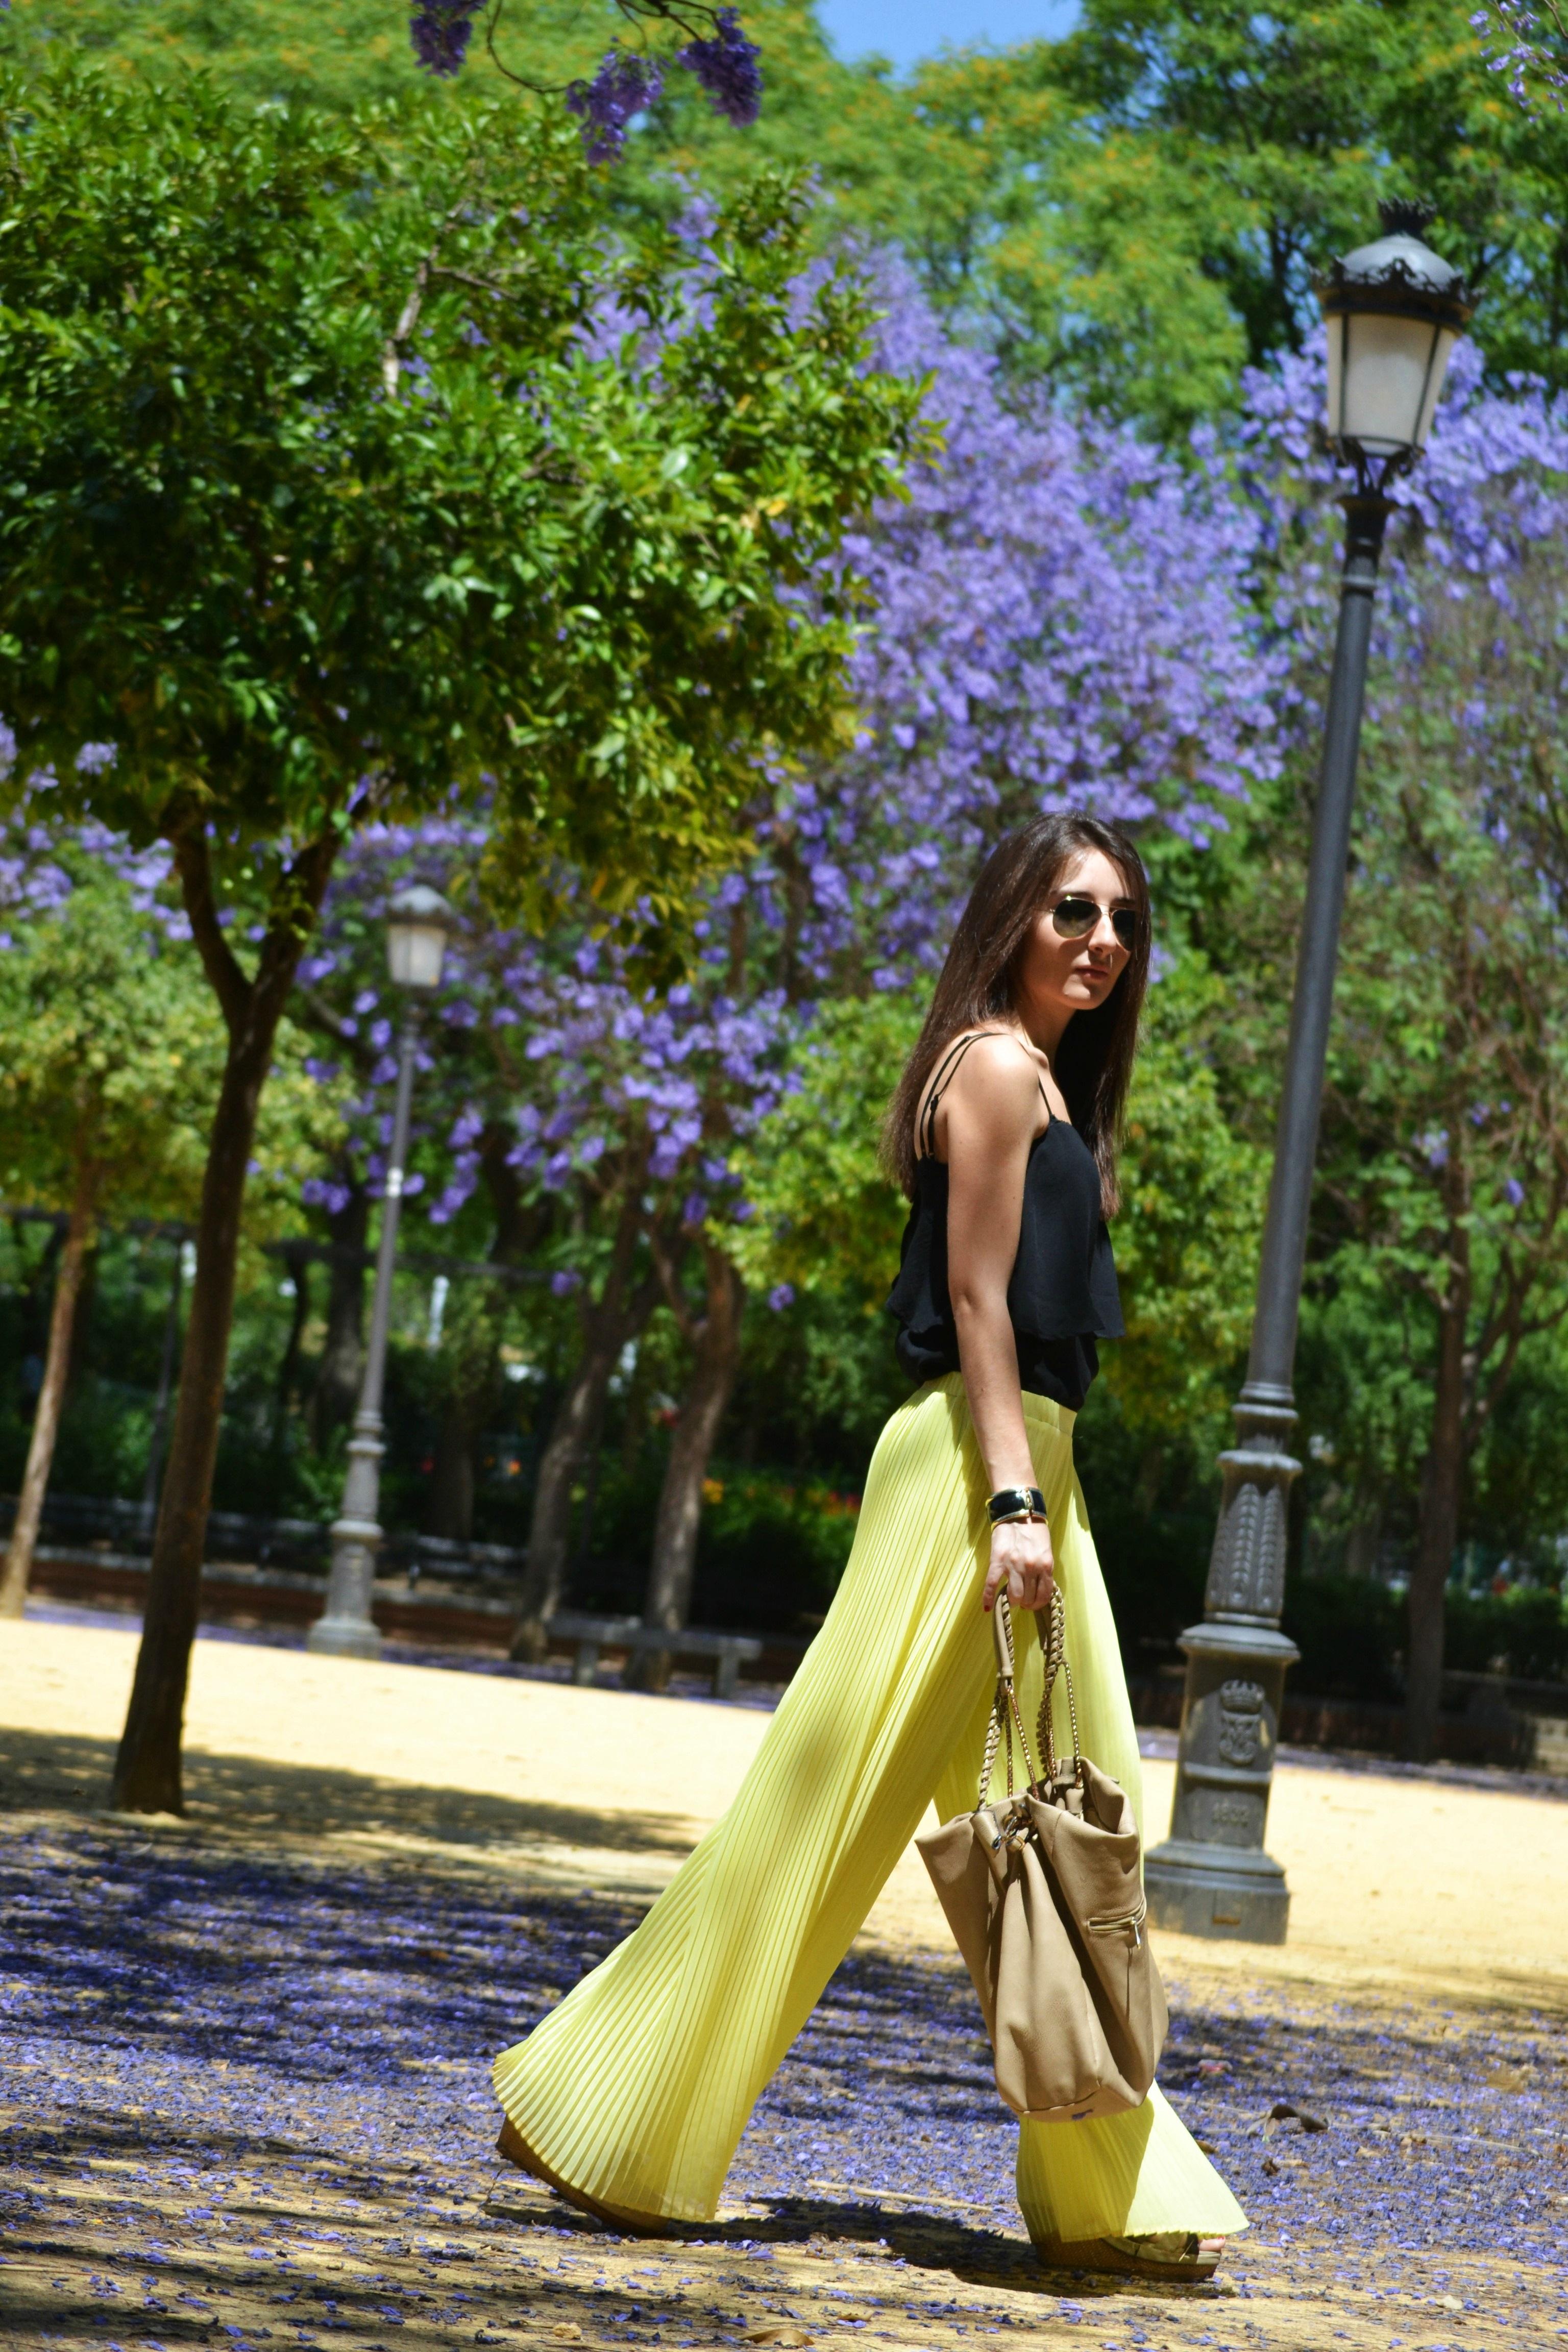 Vuelta a los 70 | Travel to Fashion